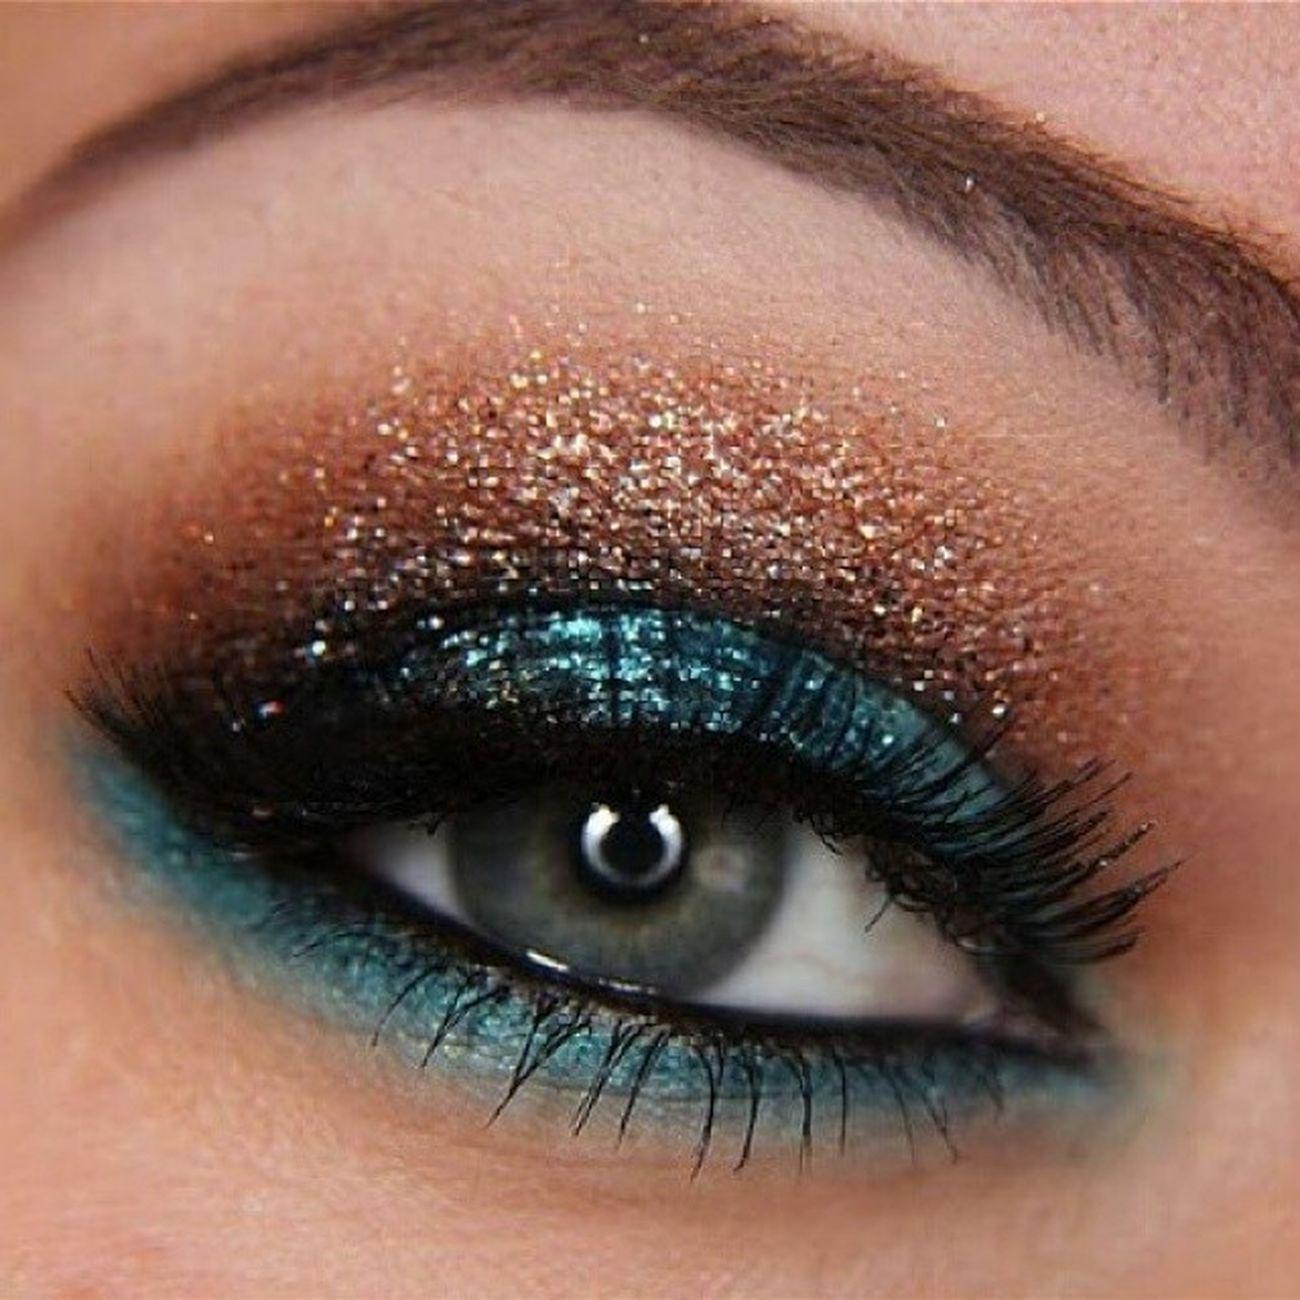 Fashionworkstv Makeup Eyeshadow GalaxyStyle Colorful Colors Fashionwork5